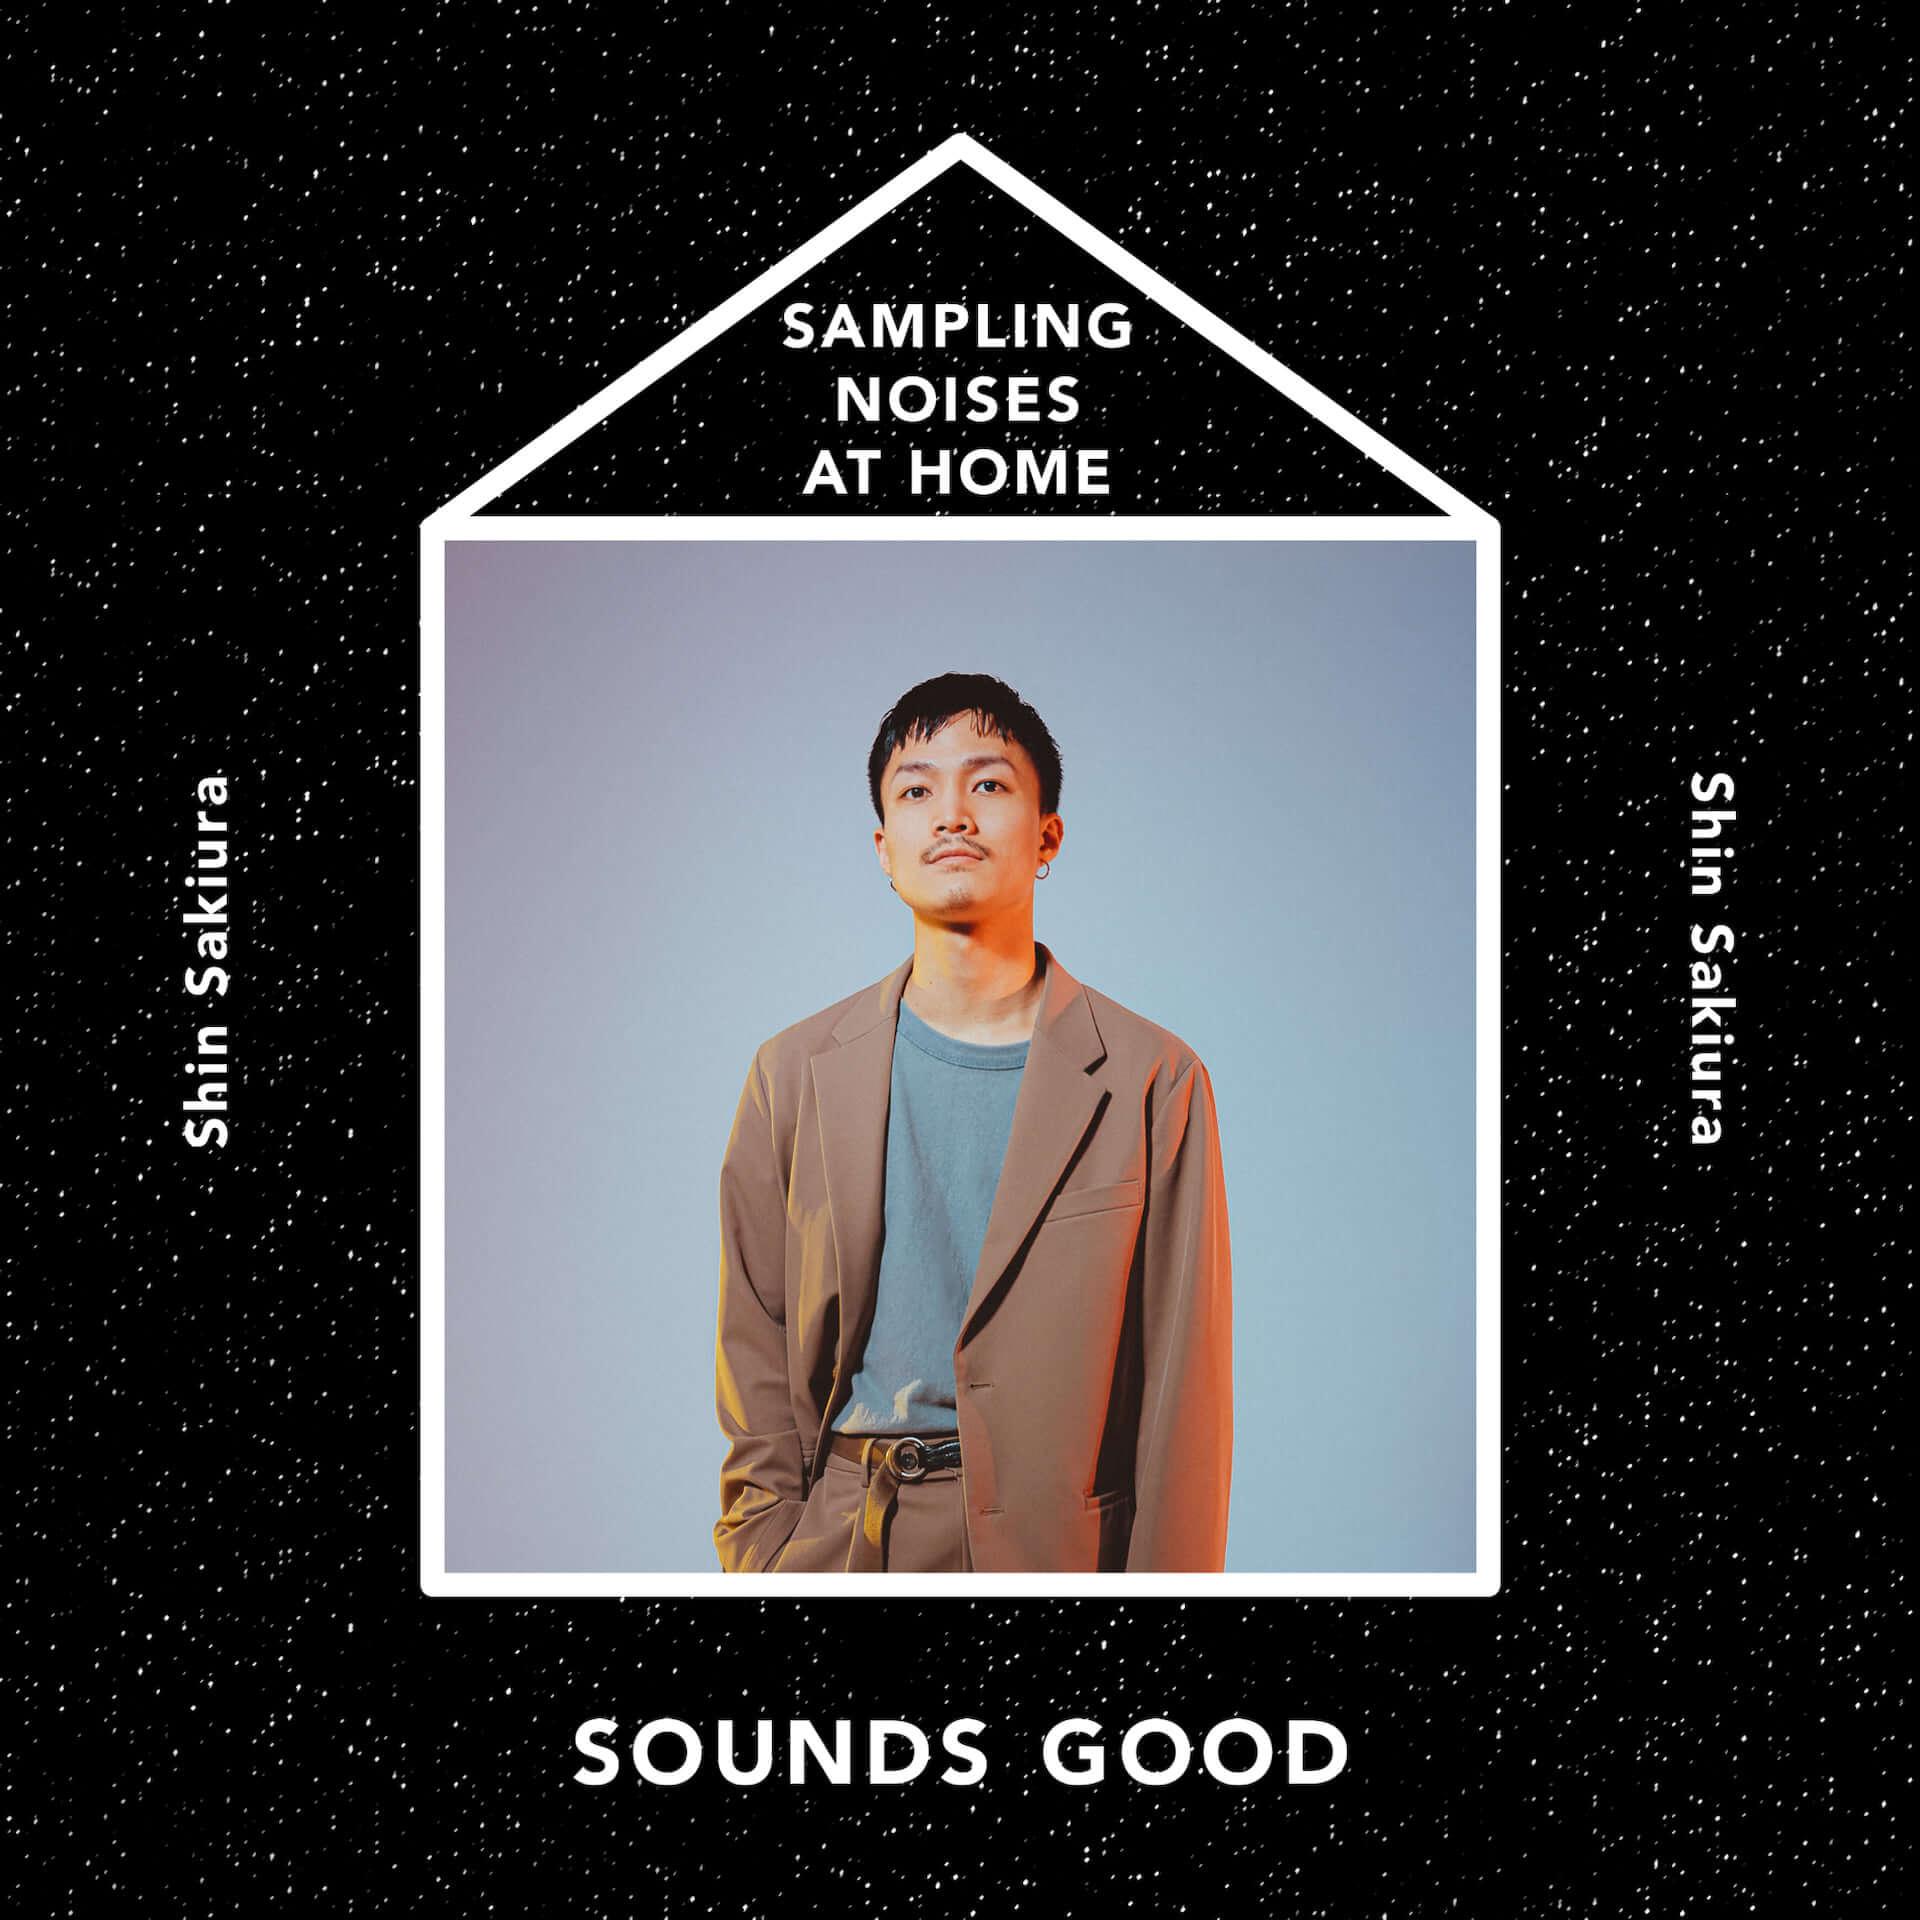 SOUNDS GOOD®とblock.fmによるコンピアルバムがリリース|80KIDZ、TAAR、Shin Sakiuraの楽曲が収録 music200603_feelsoundsgood_4-1920x1920